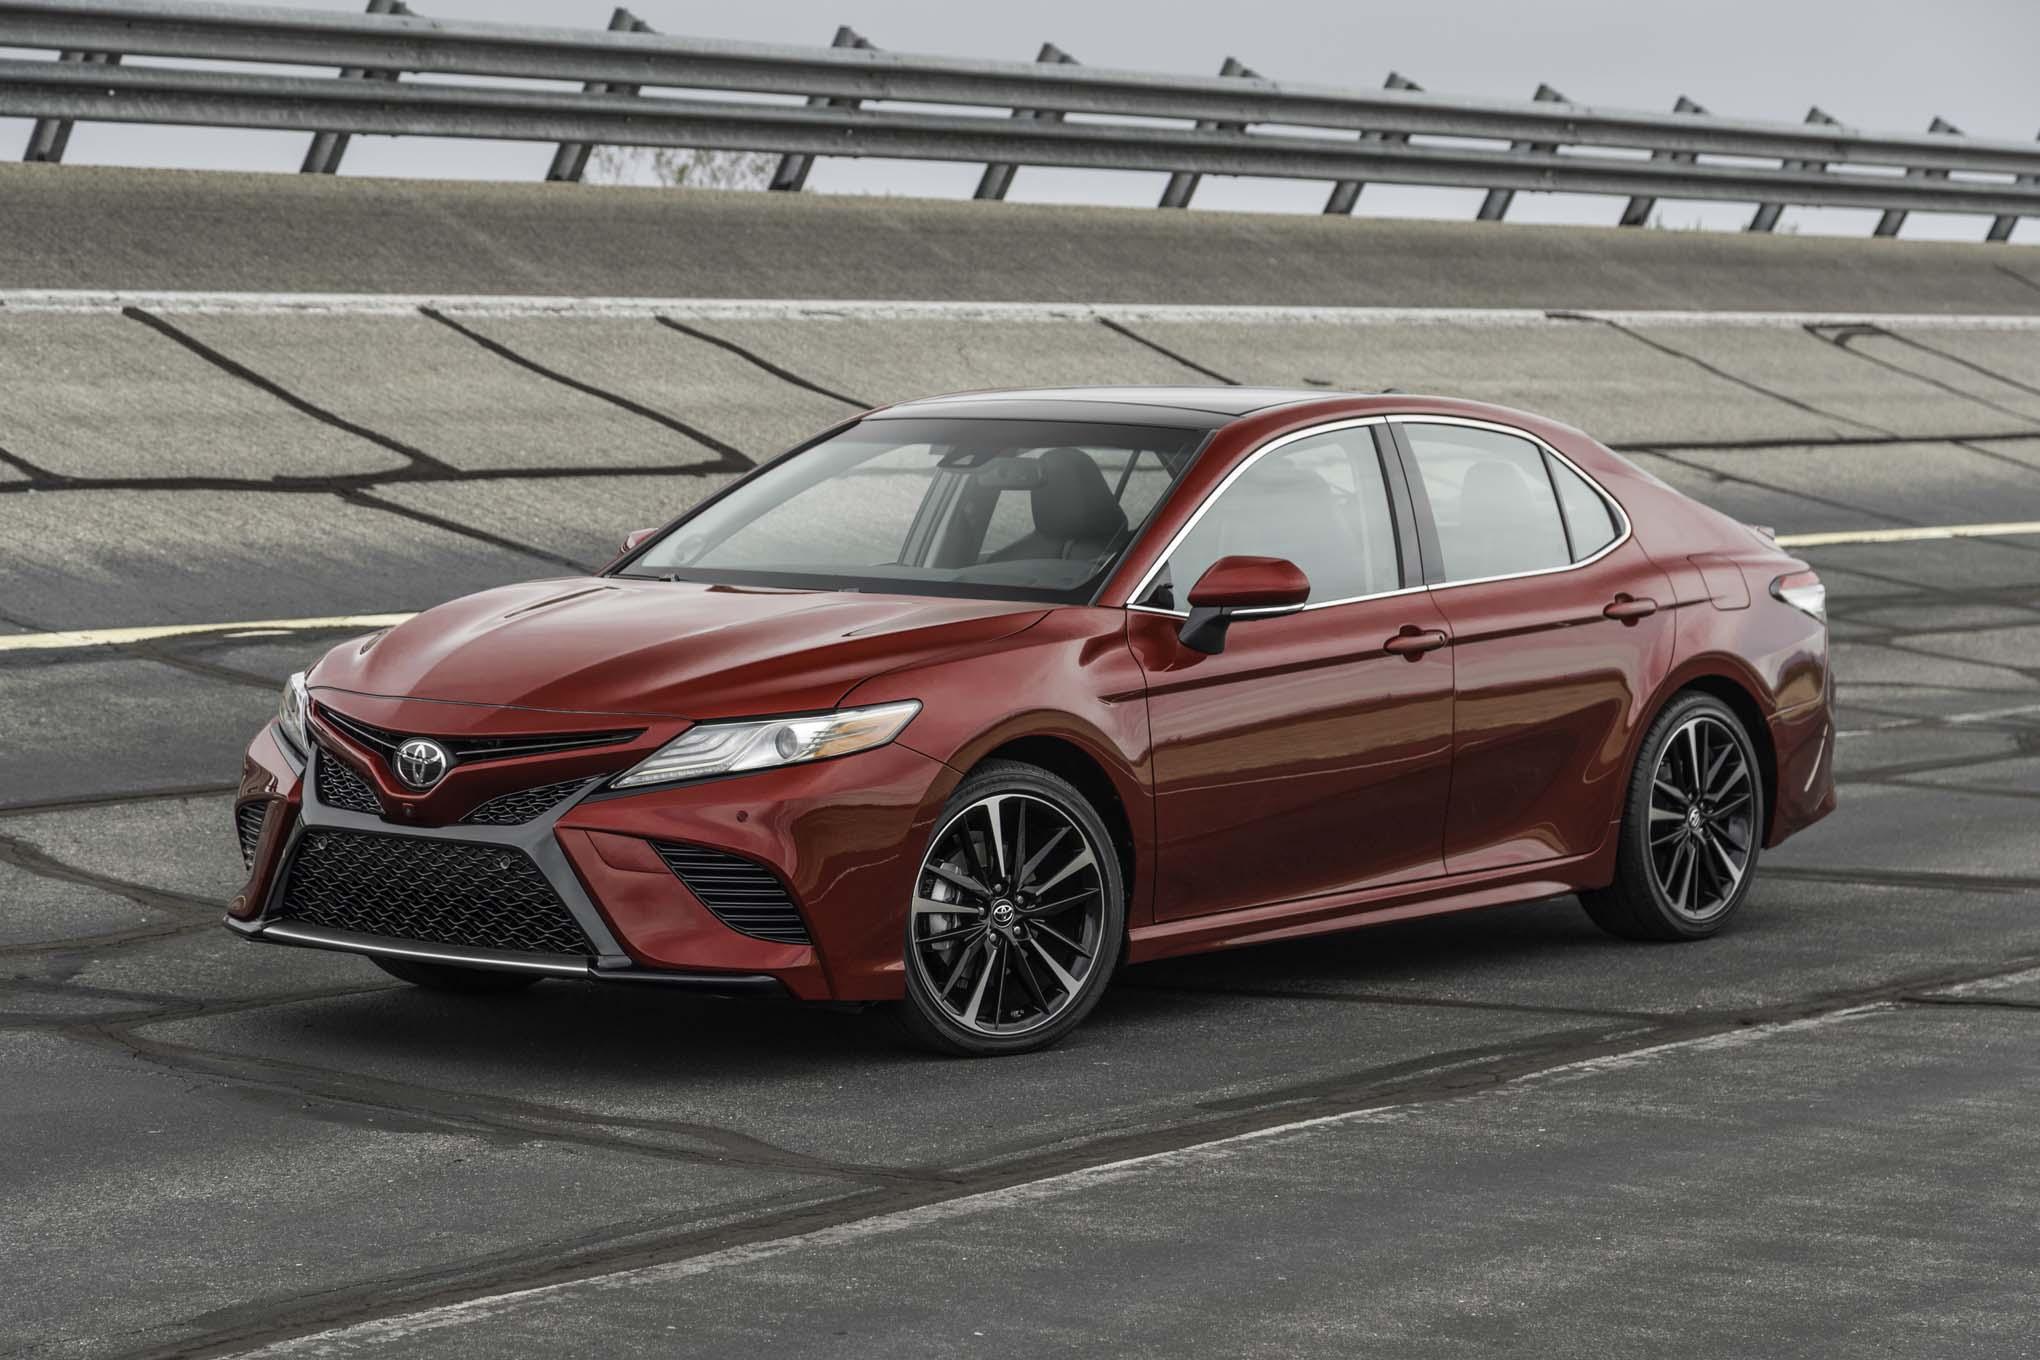 2018-Toyota-Camry-XSE-V-6-front-three-quarter.jpg